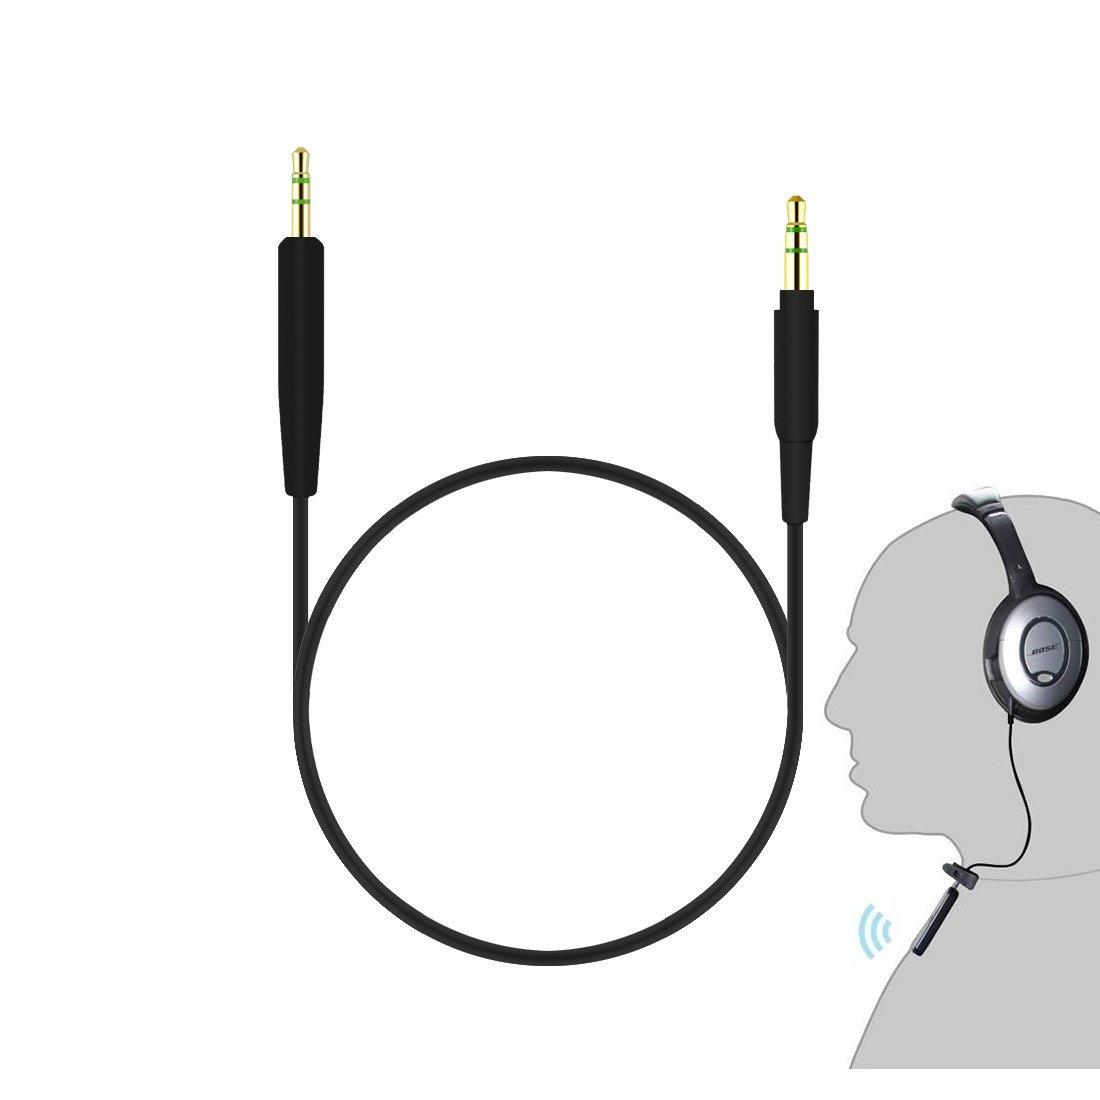 QuietComfort QC25/Auriculares Cable//Adaptador Bluetooth//Bluetooth receptor cable de conexi/ón negro Inal/ámbrico Kit de conversi/ón para Bose SoundTrue//SoundTrue II Around-Ear